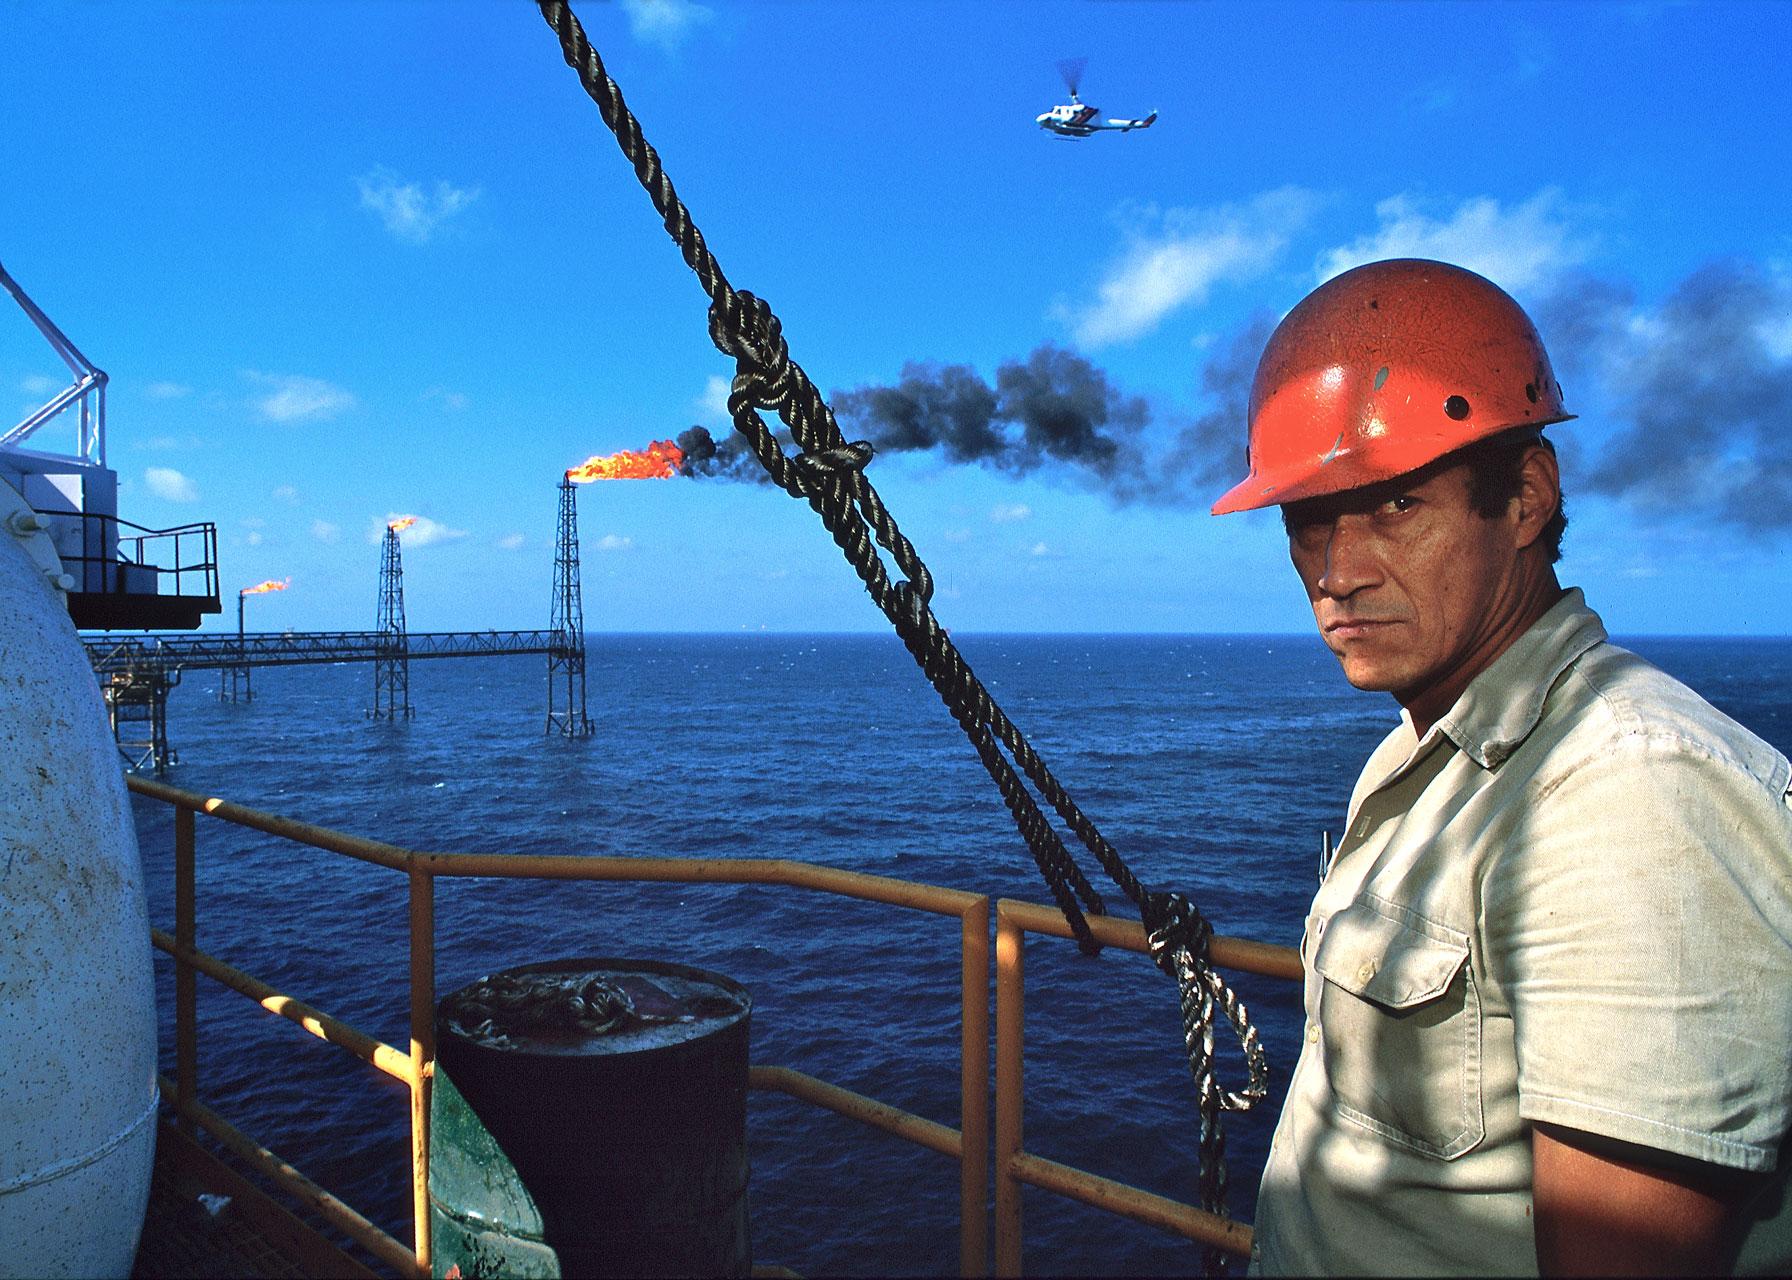 PEMEX petrol platform, Gulf of Mexico